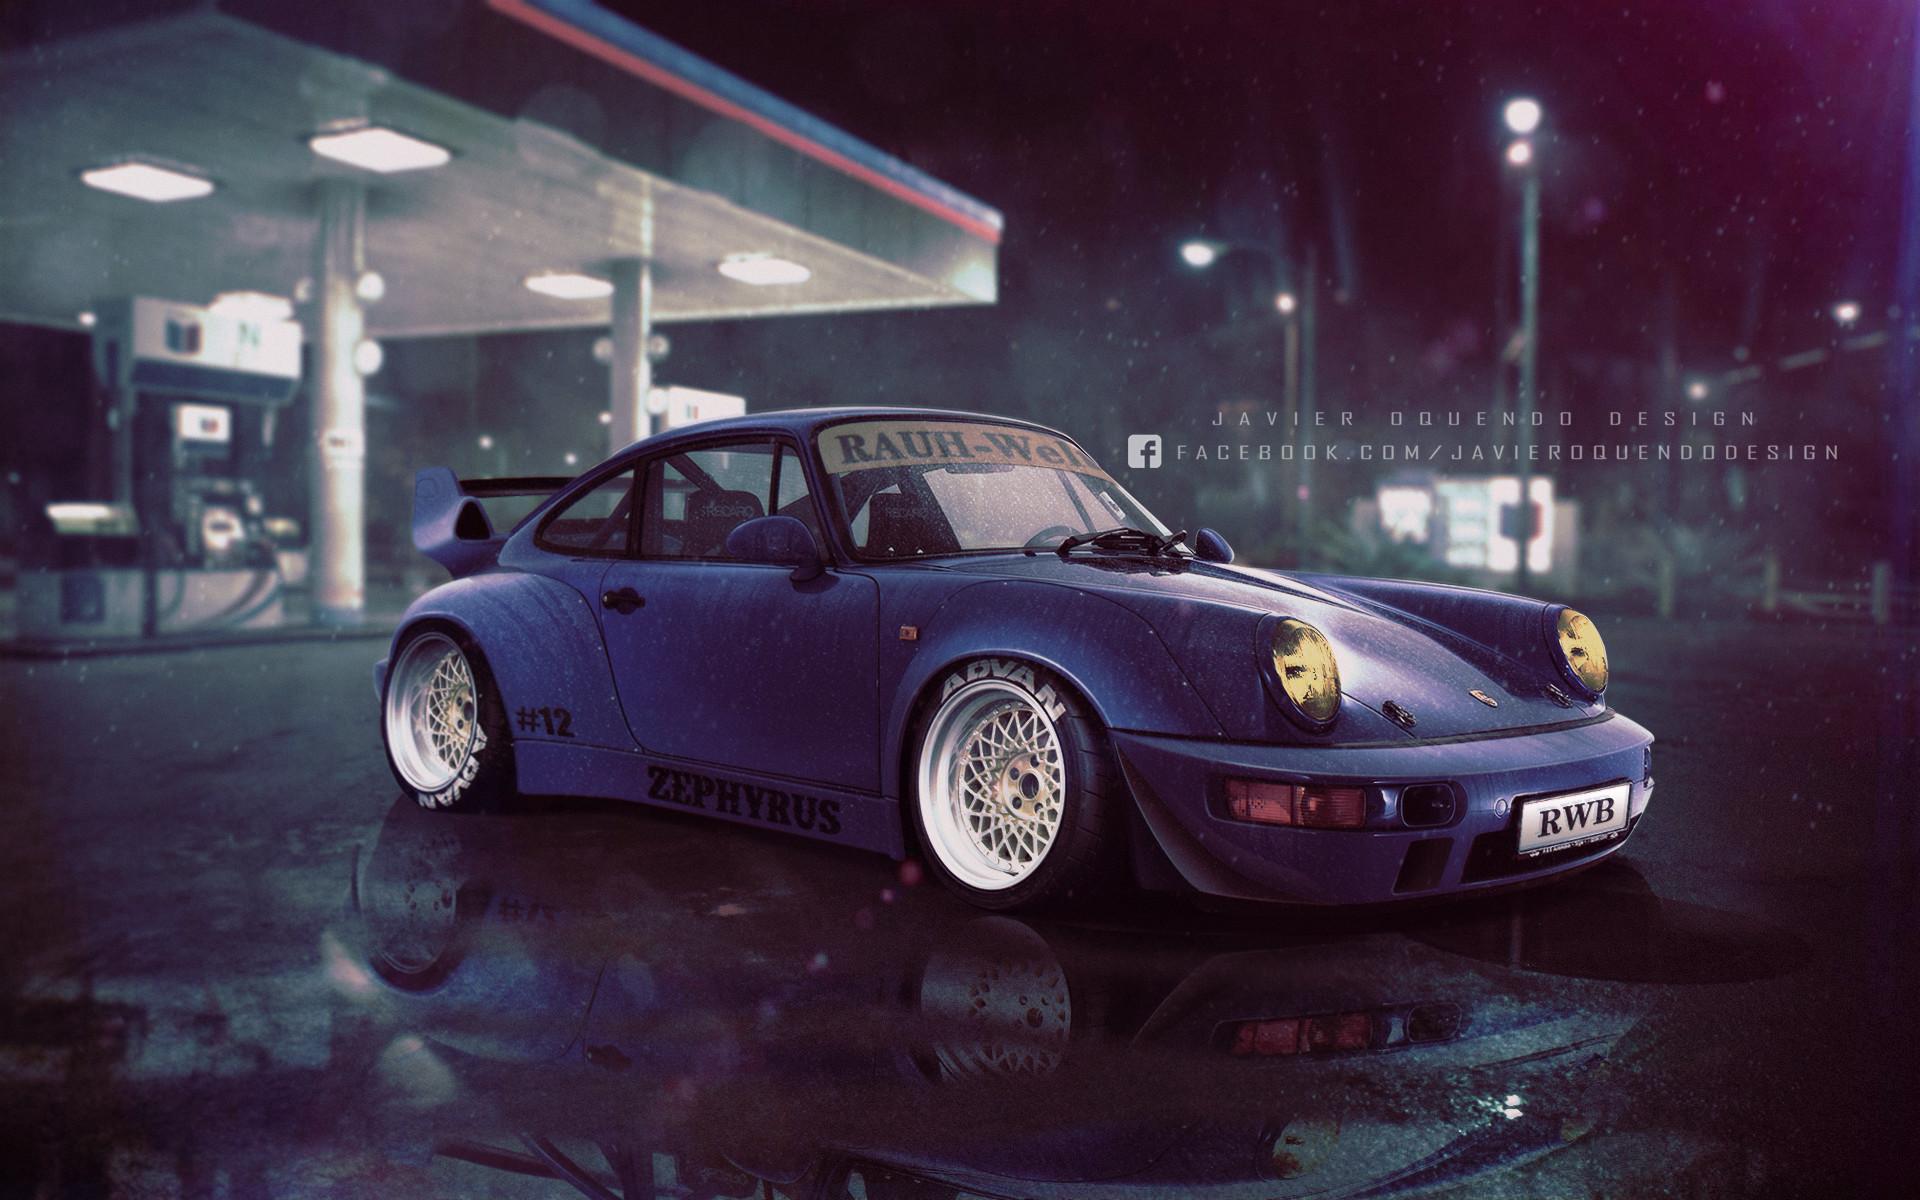 Targa Rwb Walpaper: RWB Porsche 911, Javier Oquendo